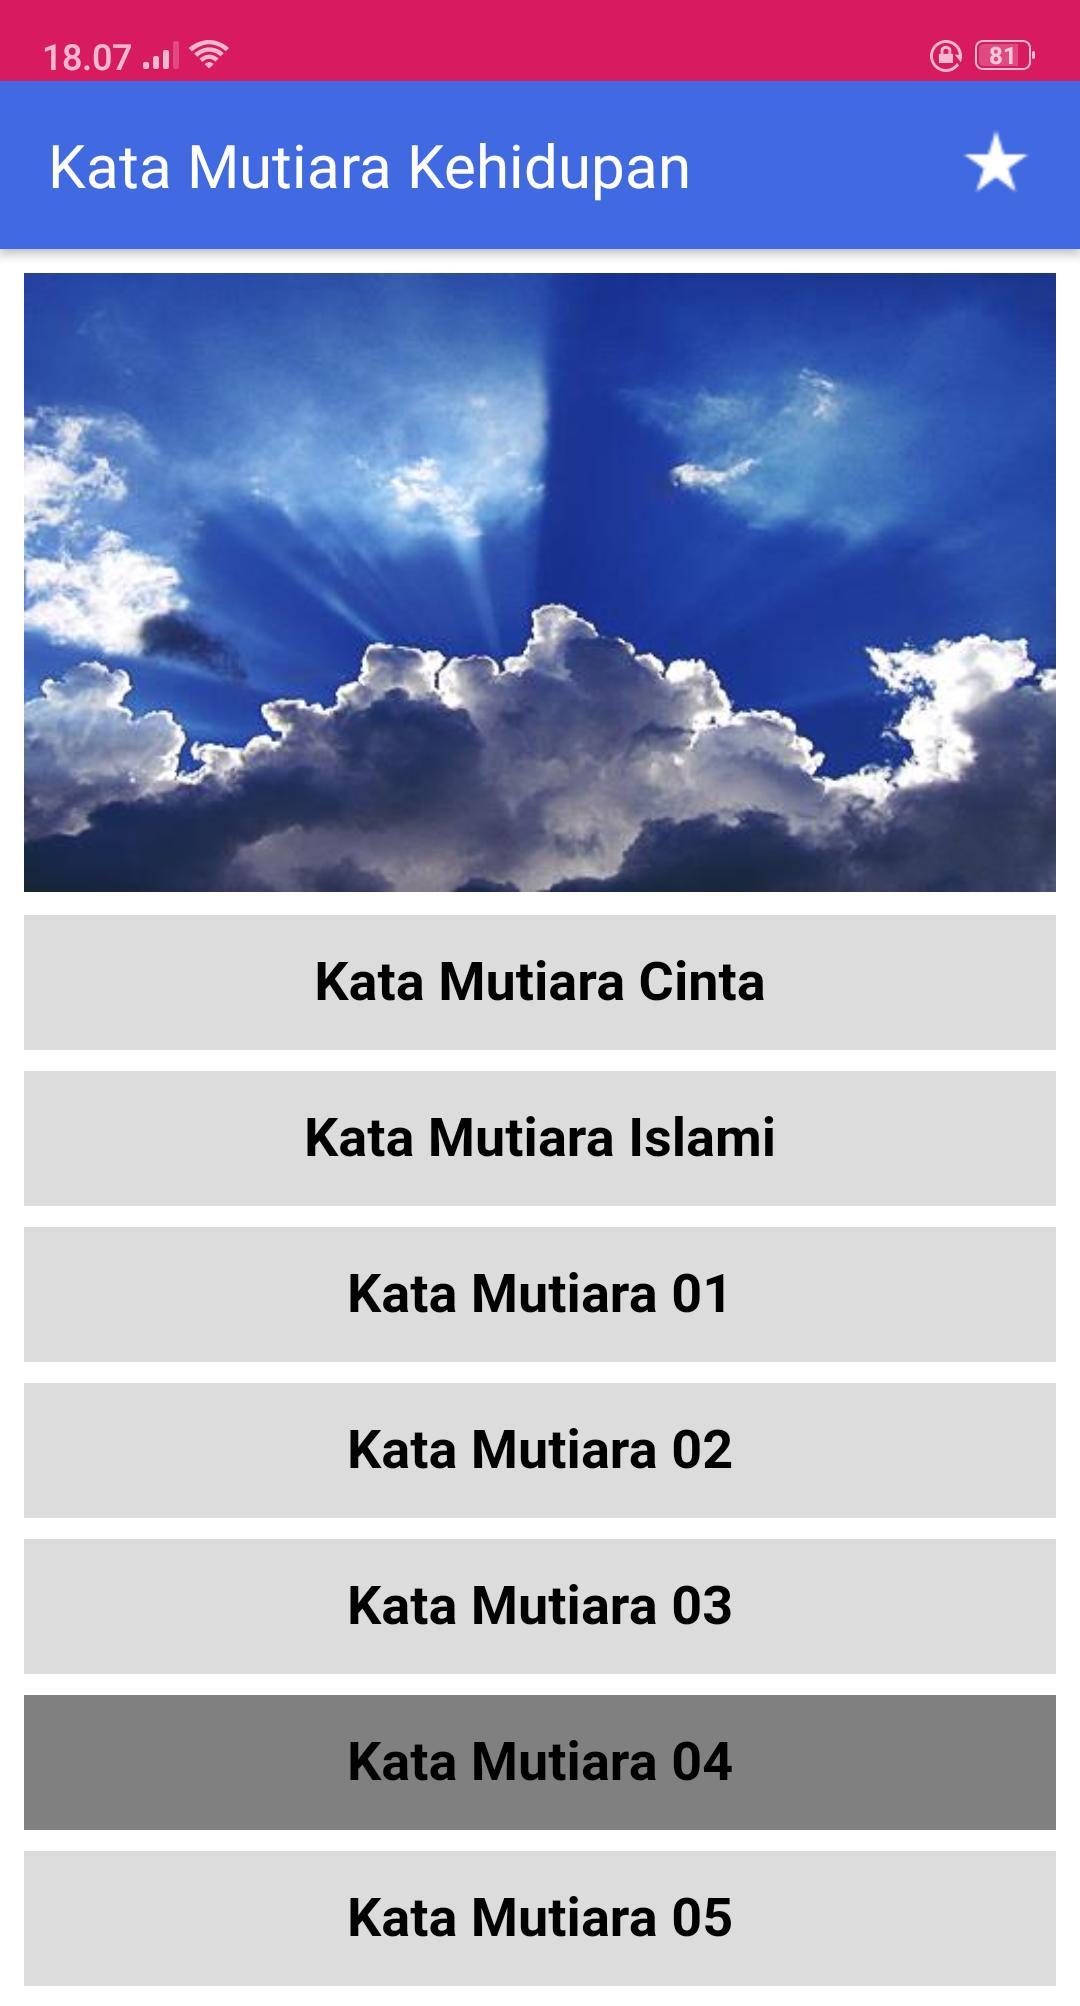 Kata Kata Mutiara Kehidupan 2019 Für Android Apk Herunterladen